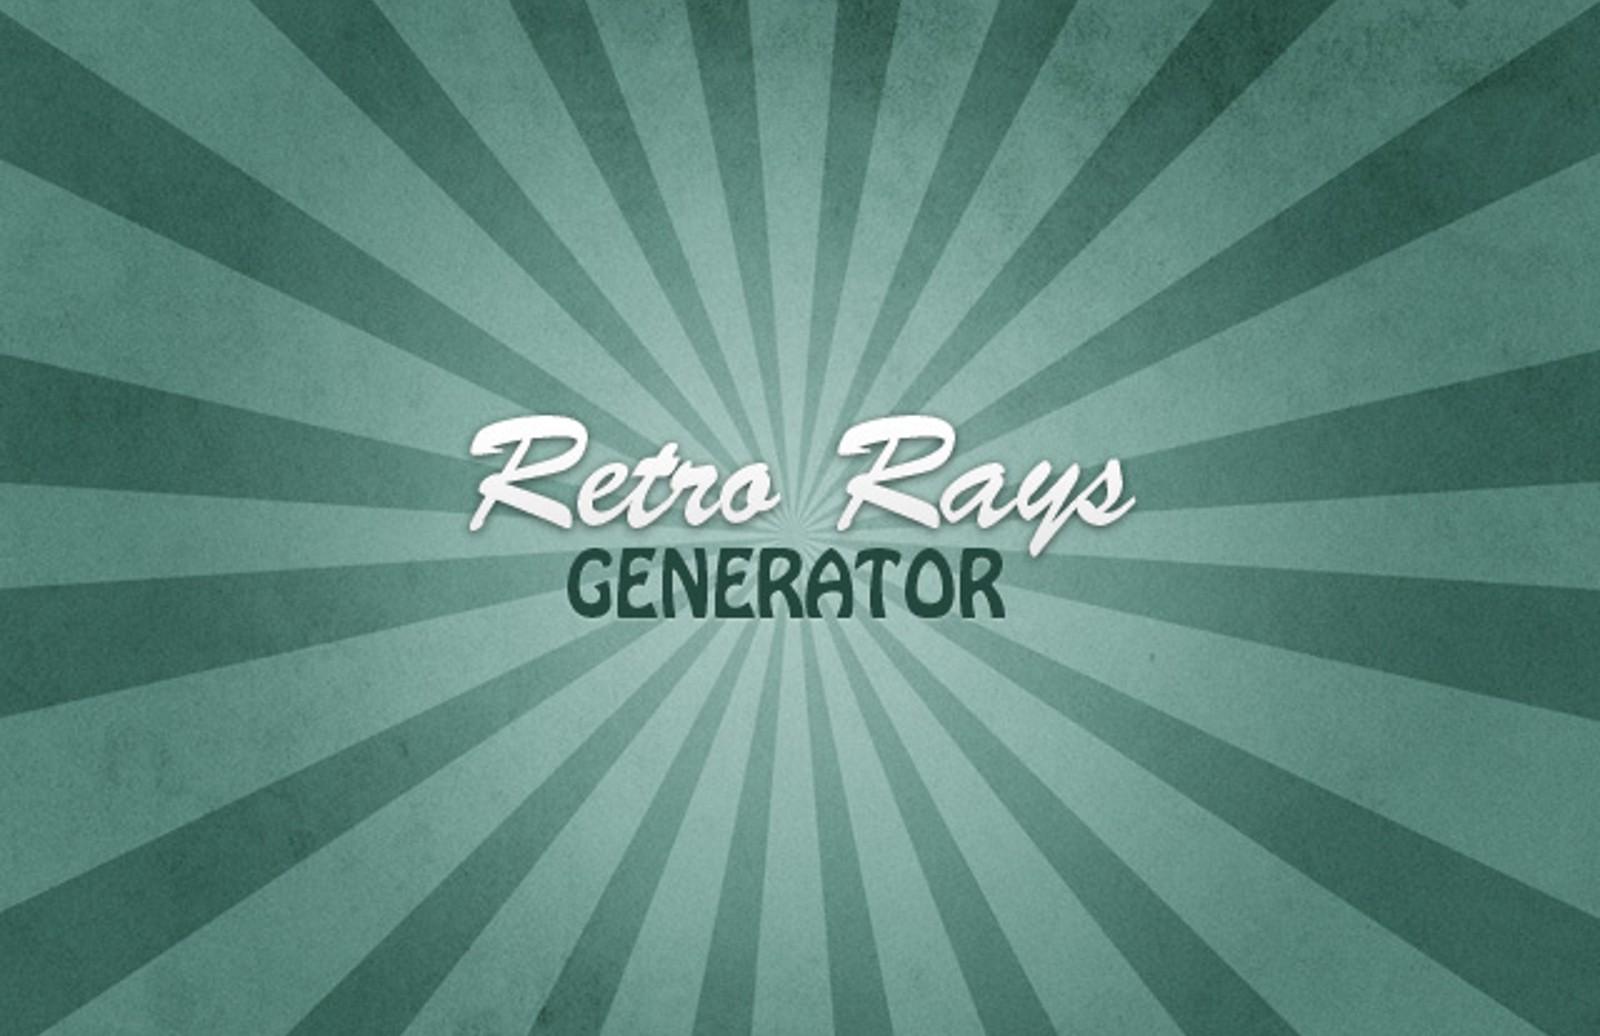 Retro  Rays  Generator  Preview1